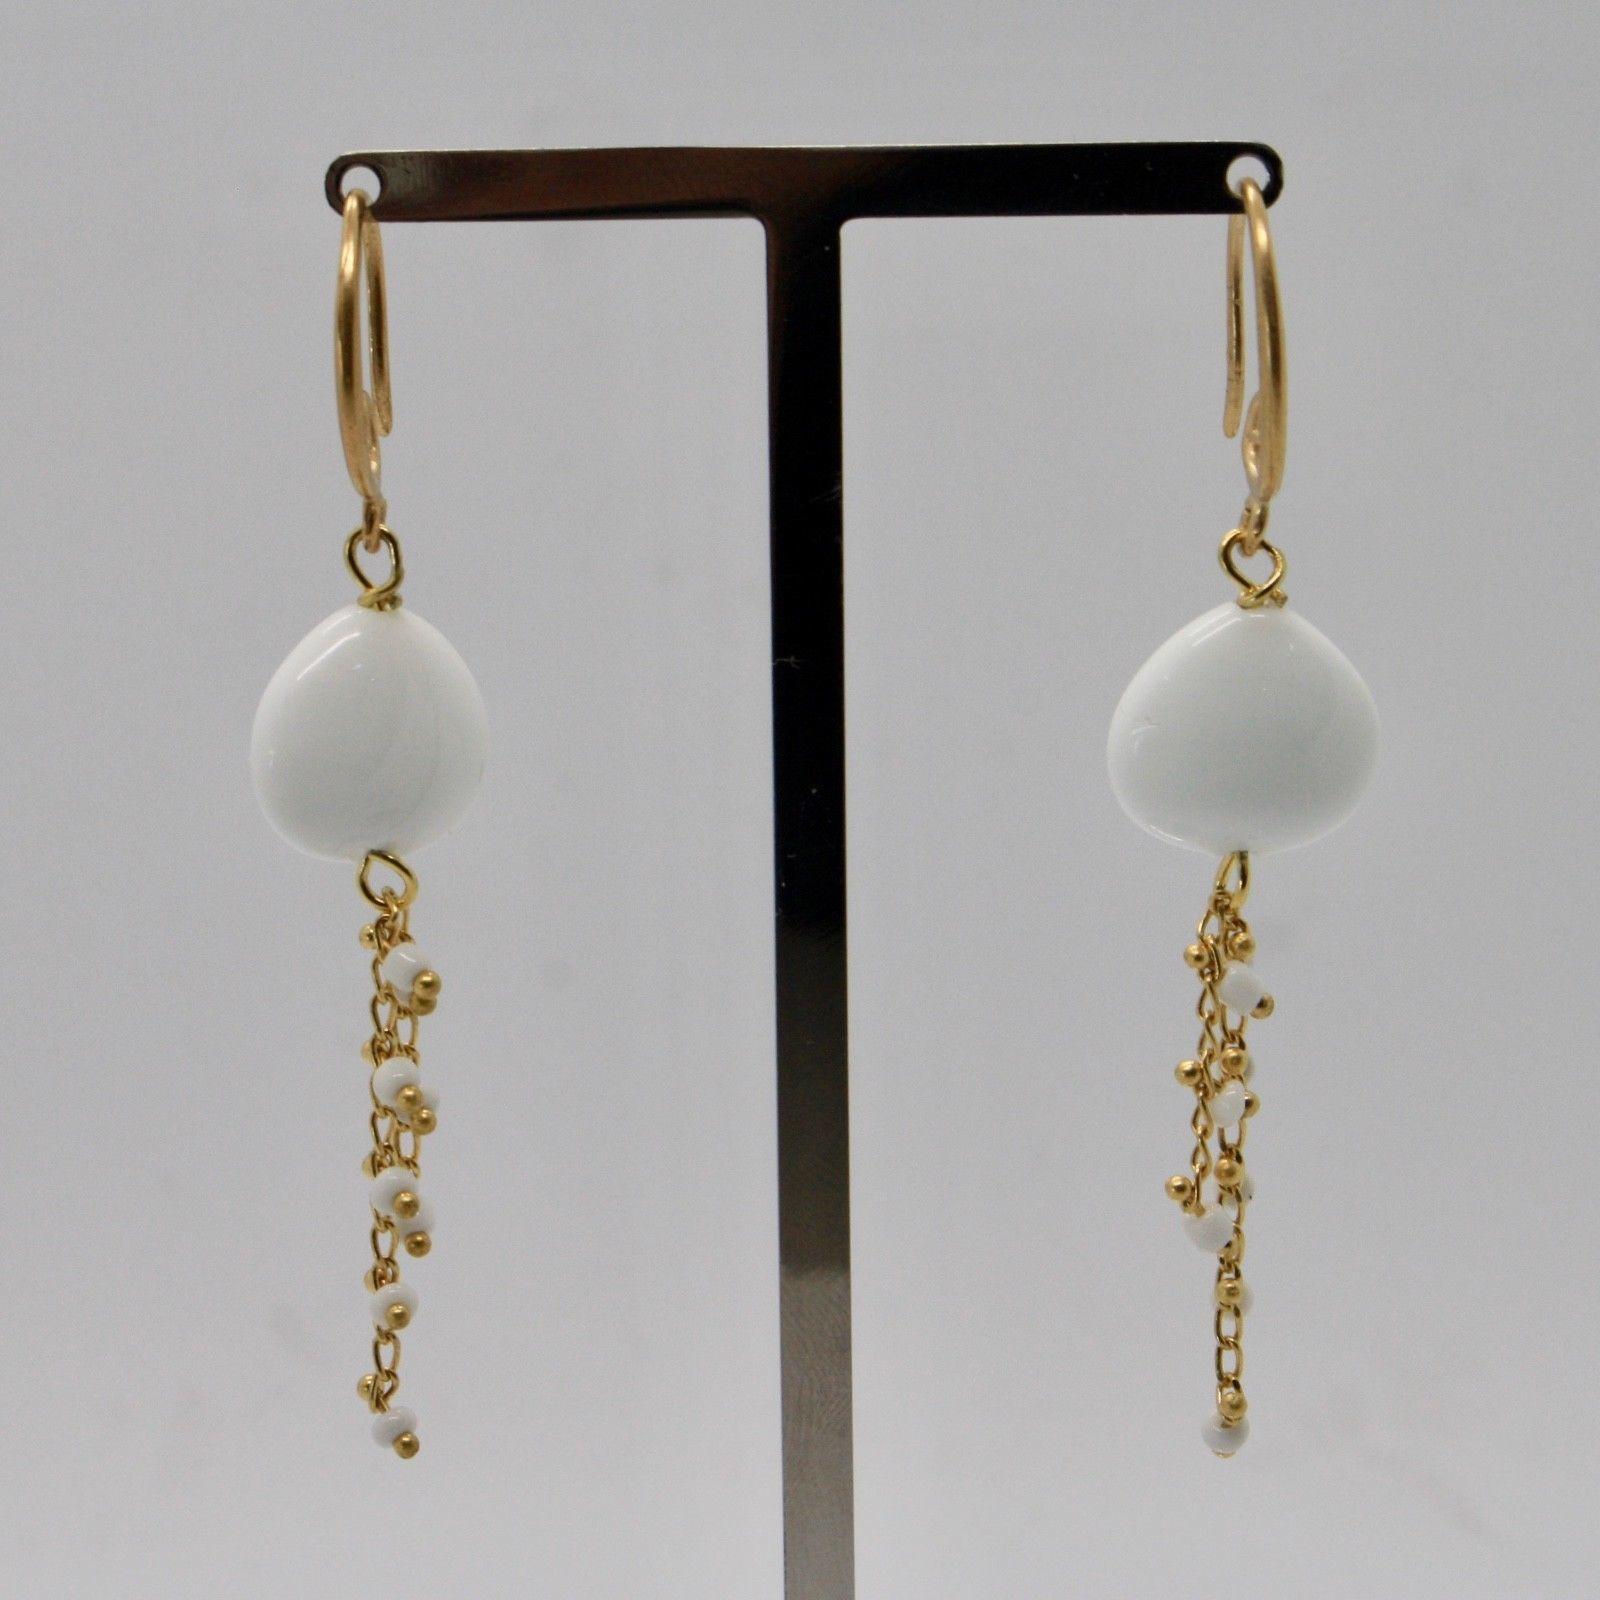 EARRINGS ANTICA MURRINA VENEZIA WITH MURANO GLASS WHITE AND GOLD OR570A02